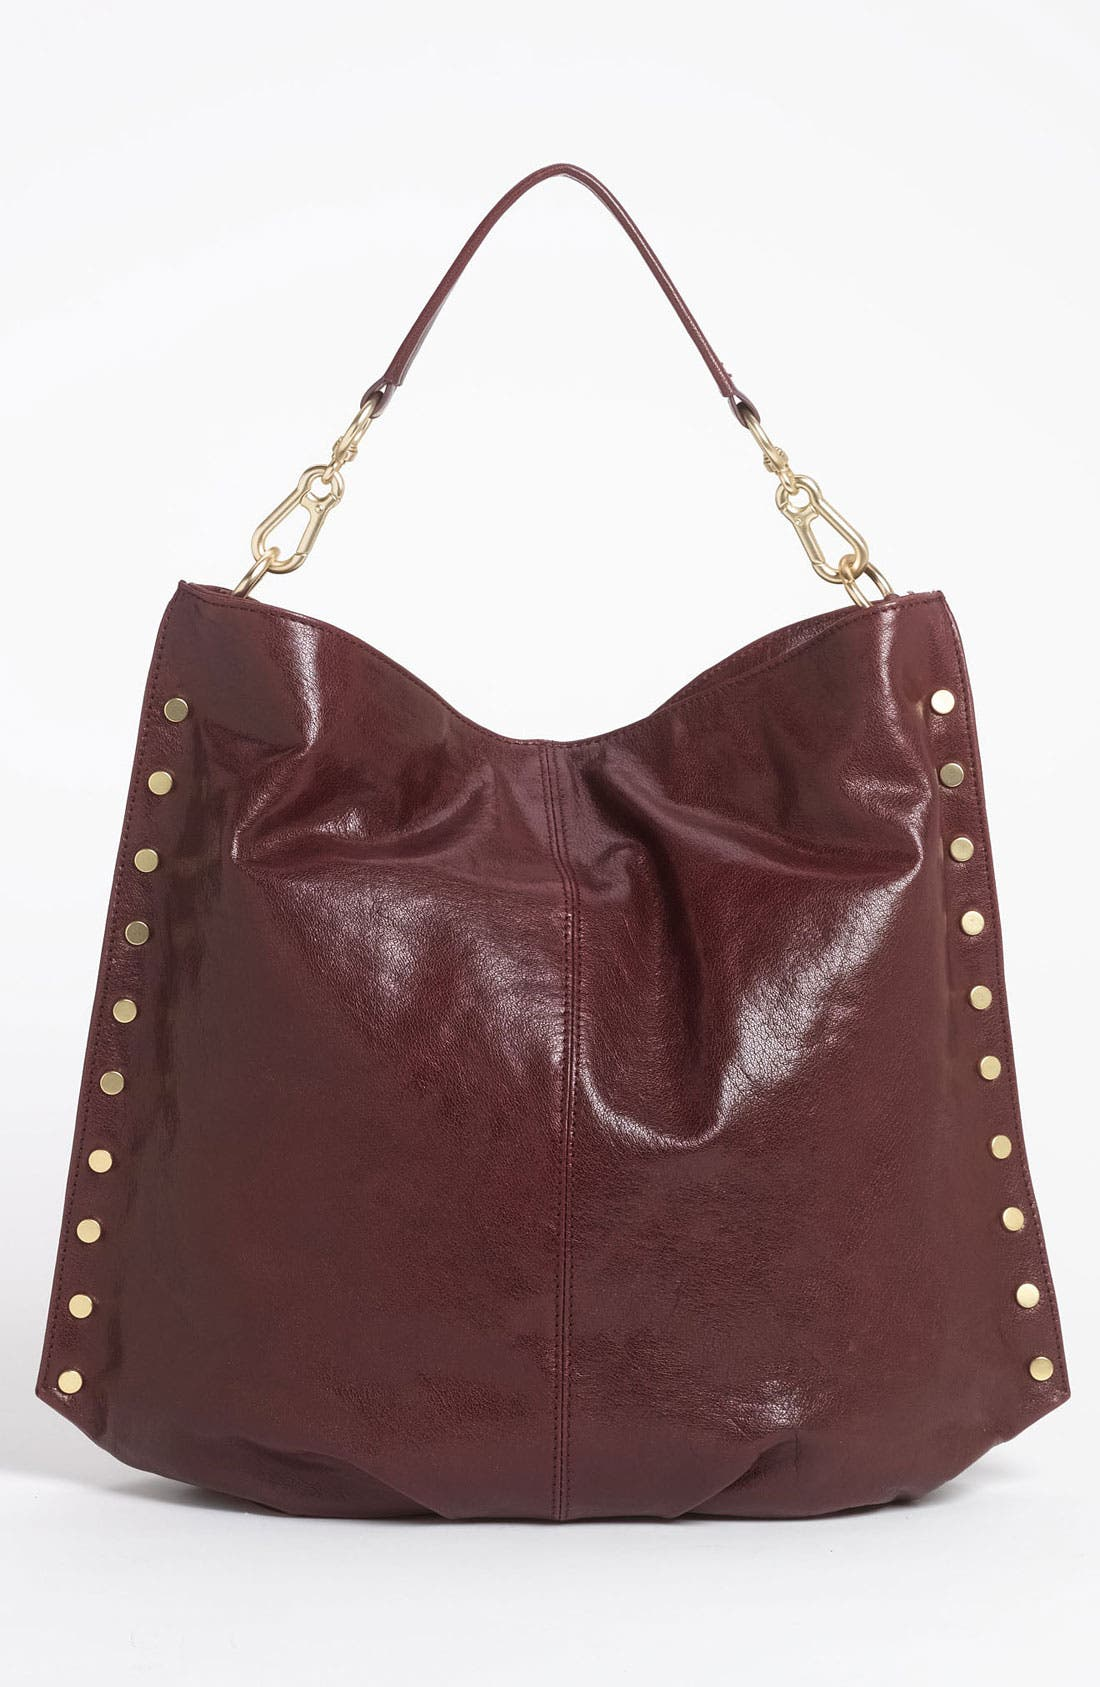 Alternate Image 1 Selected - Sloane & Alex 'Angie' Leather Hobo